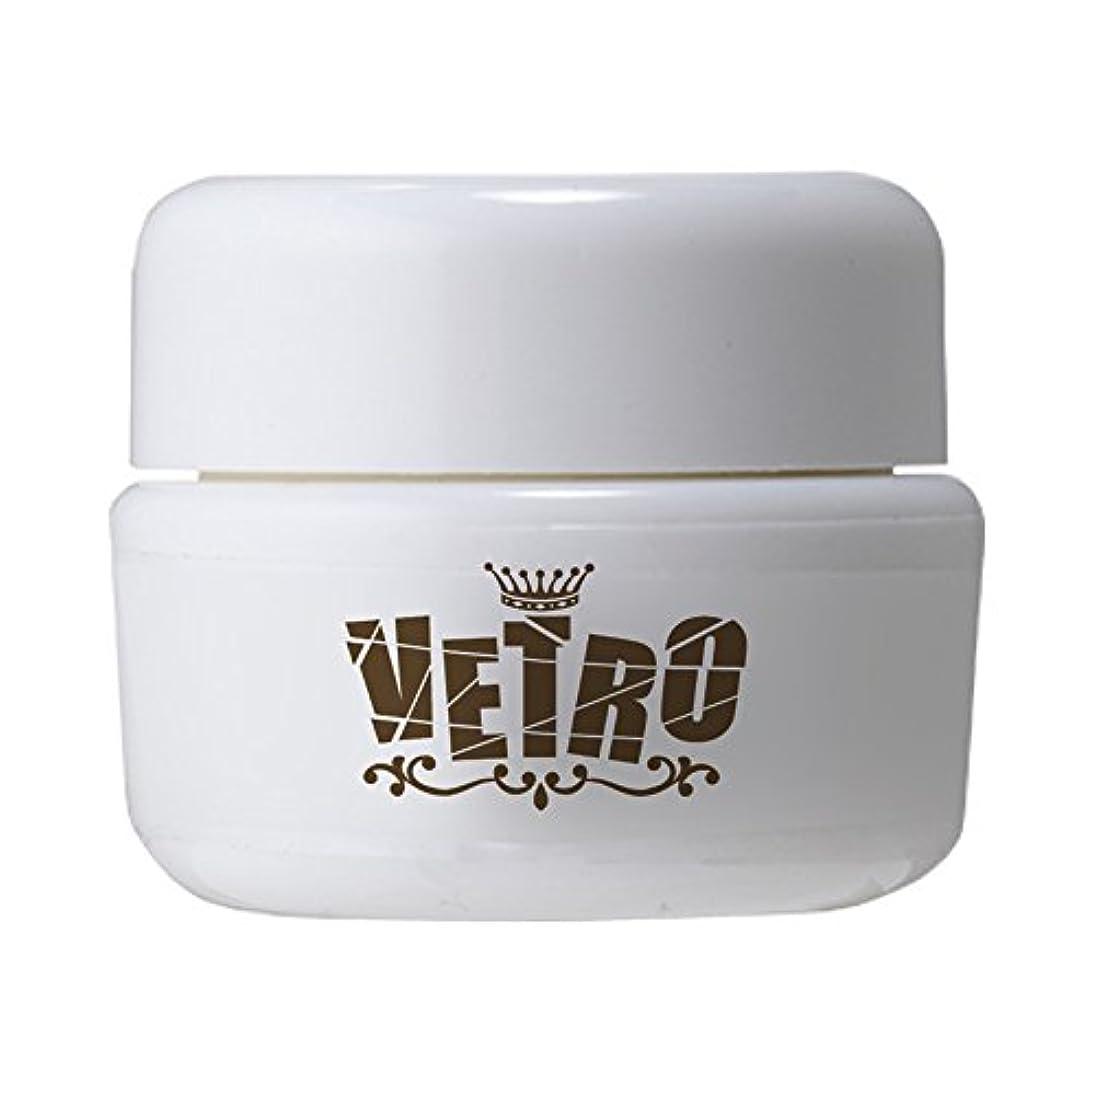 VETRO No.19 カラージェル マット VL072 バイオレット 4ml